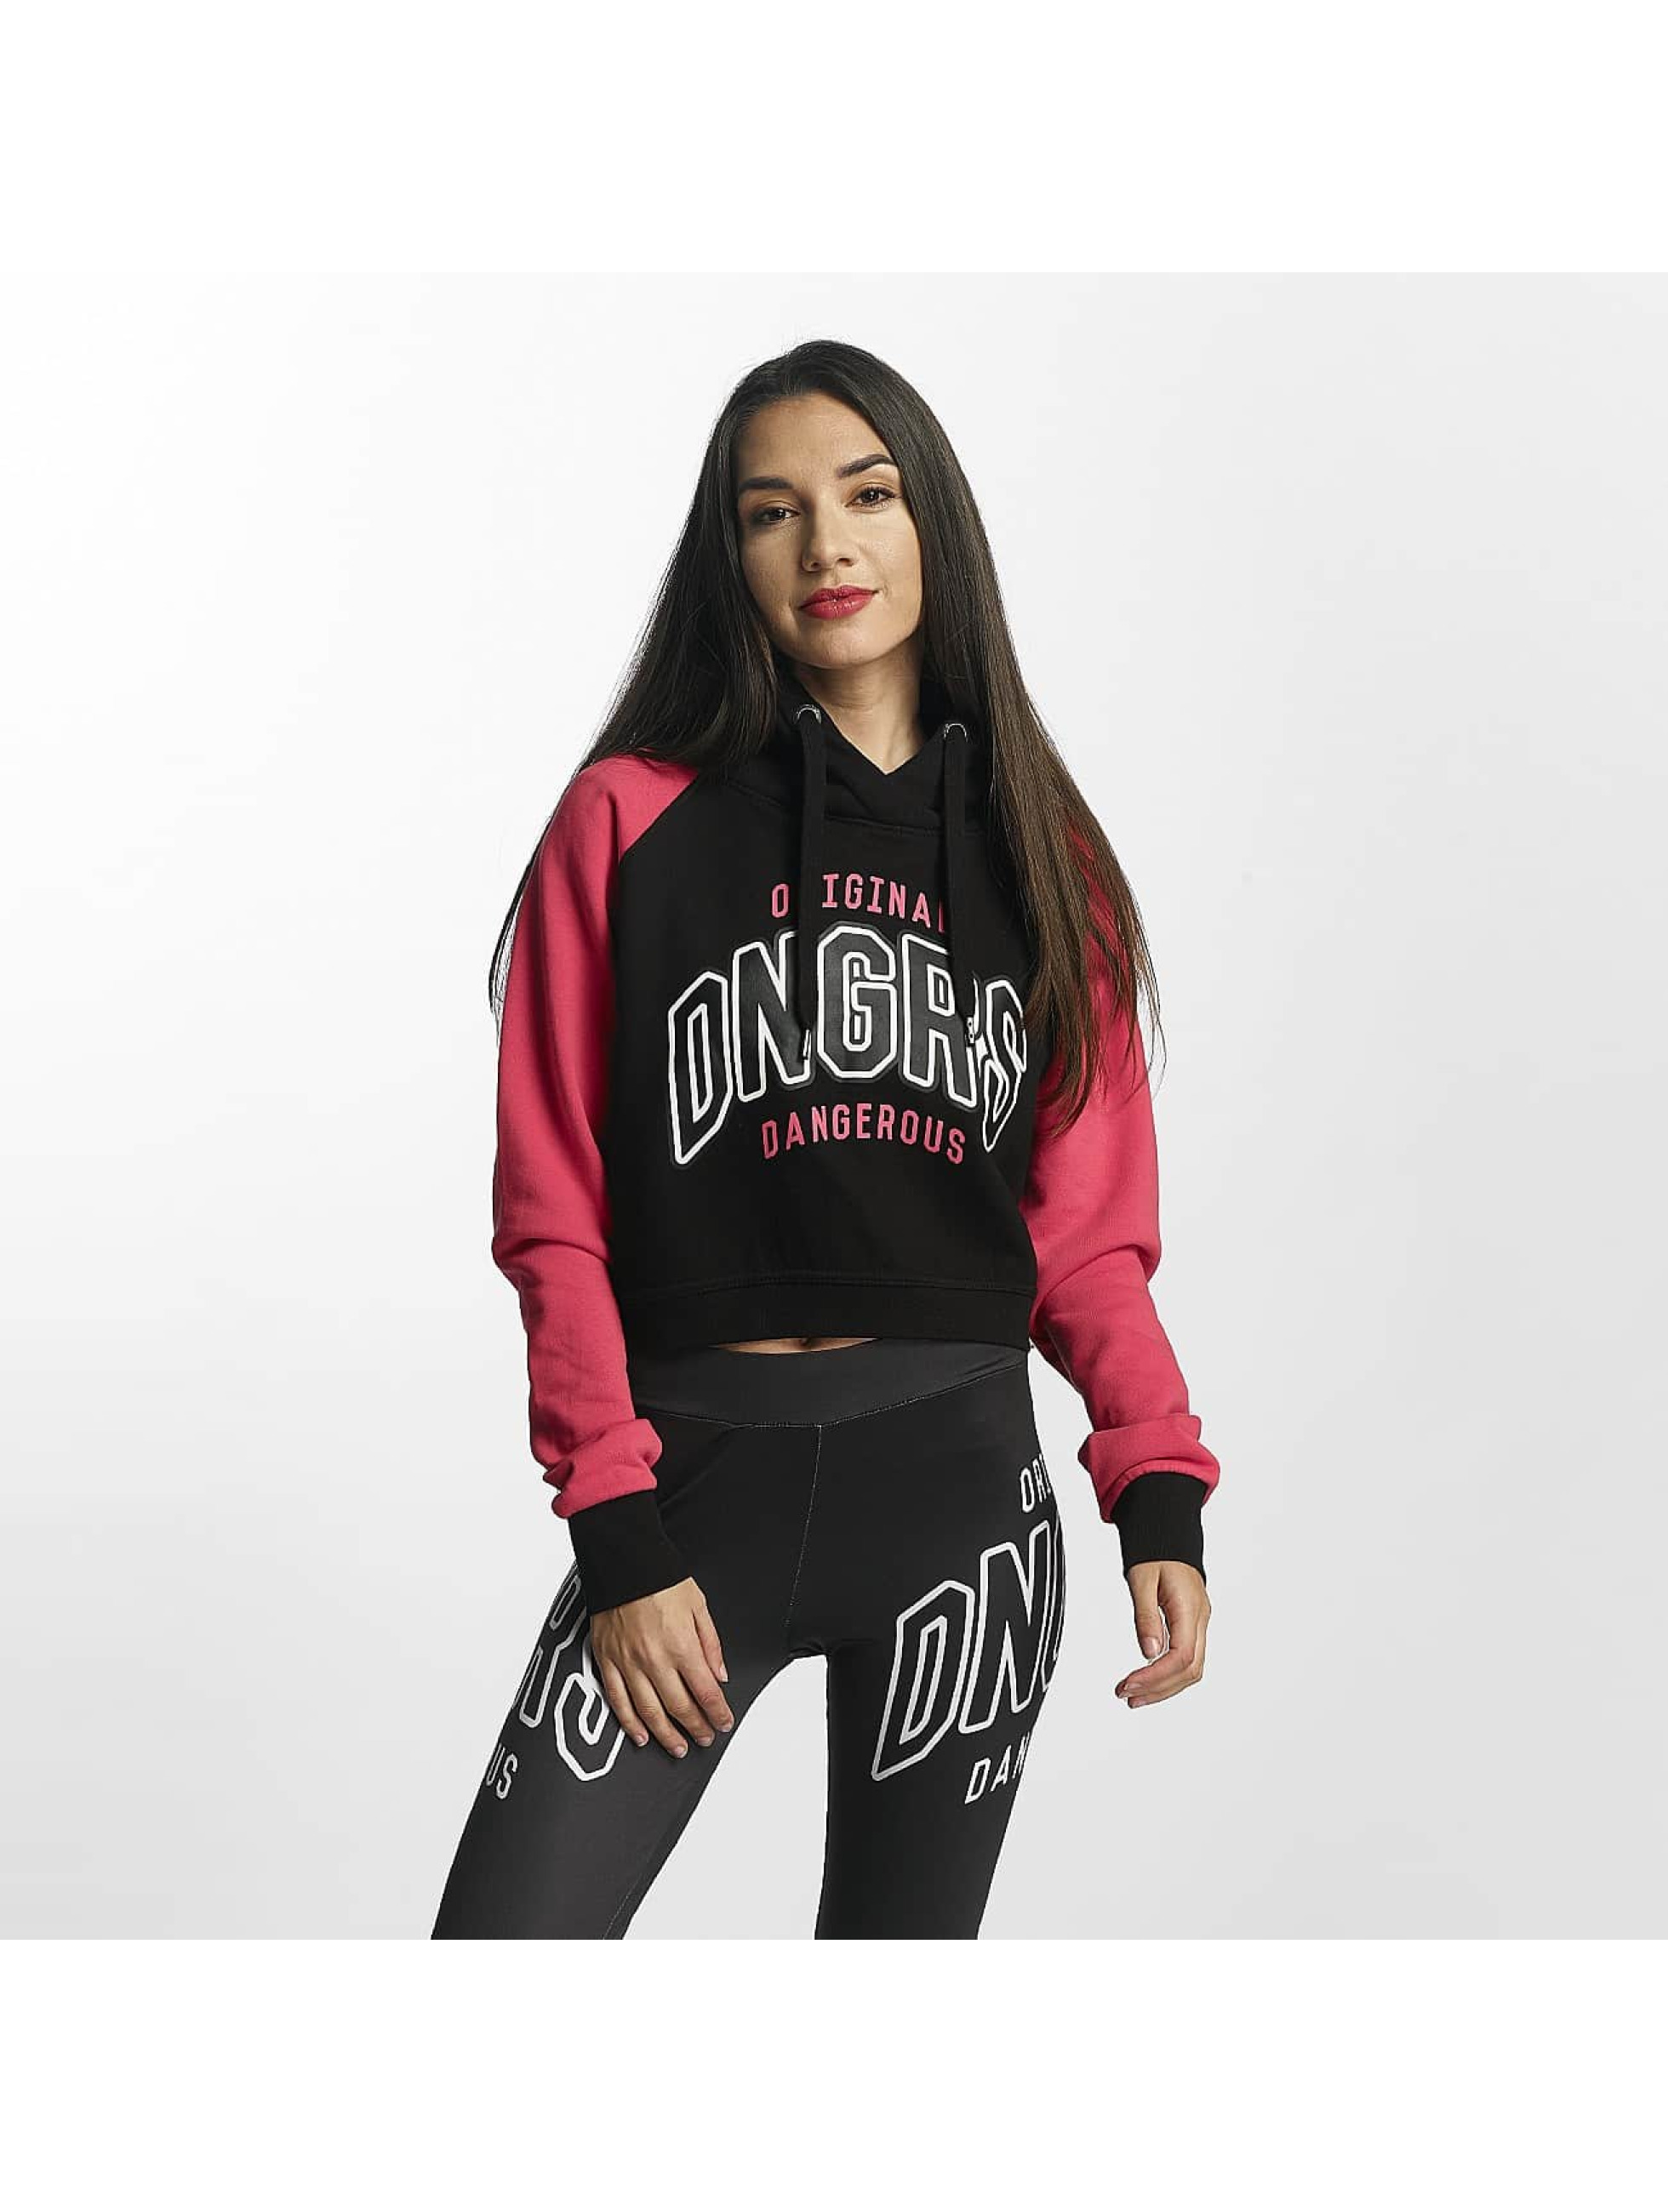 Dangerous DNGRS / Hoodie OriginalID in pink XL